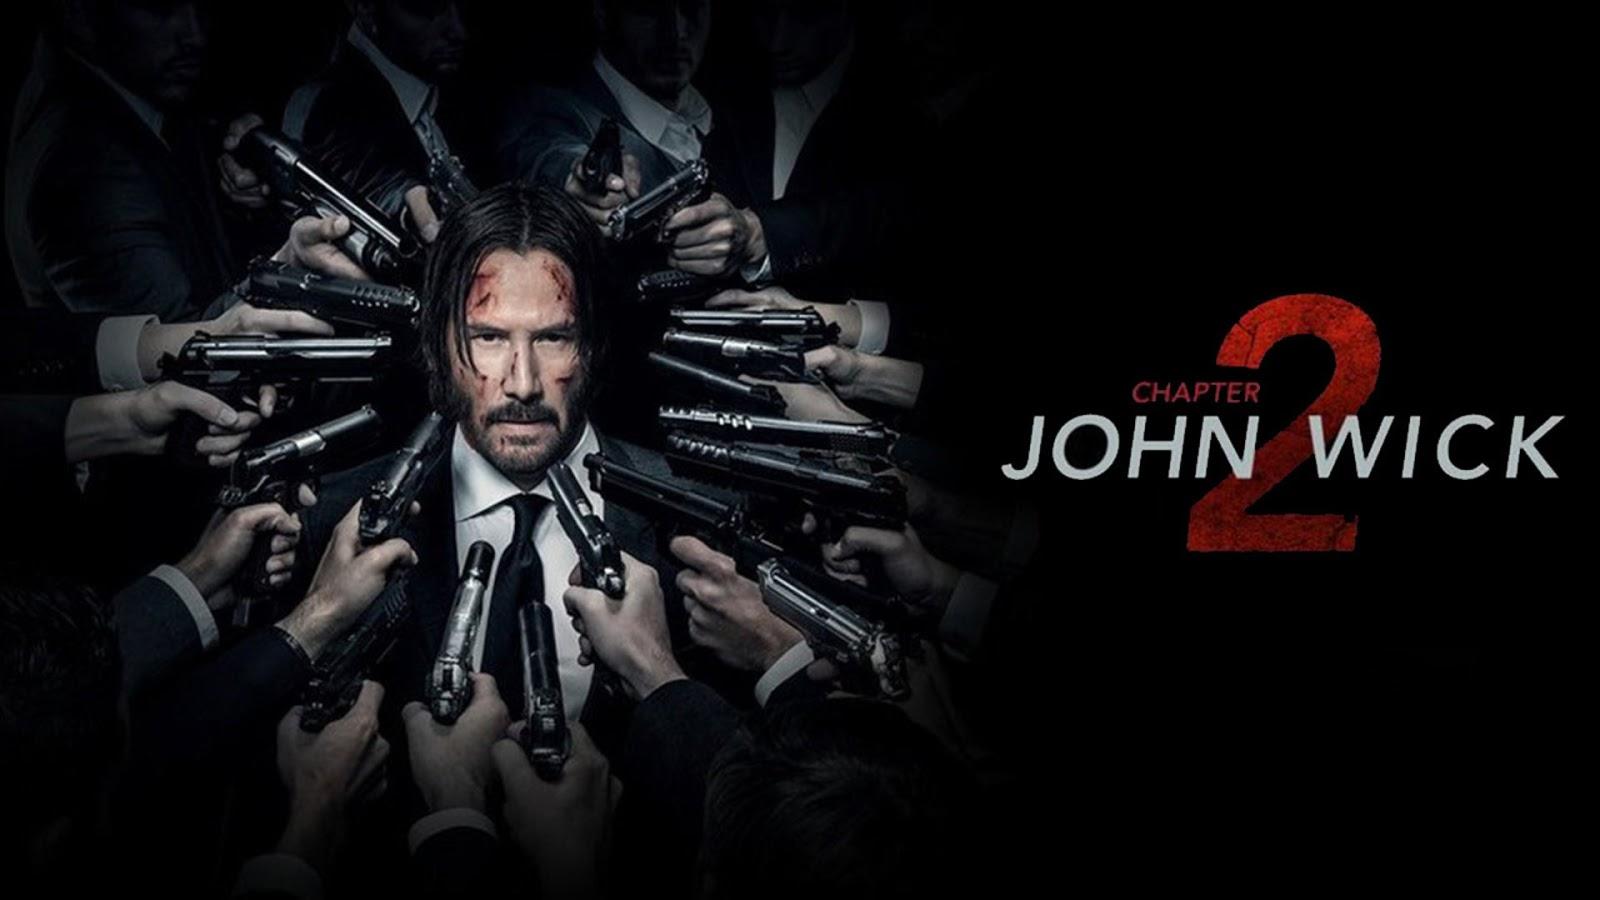 John Wick Full Movie